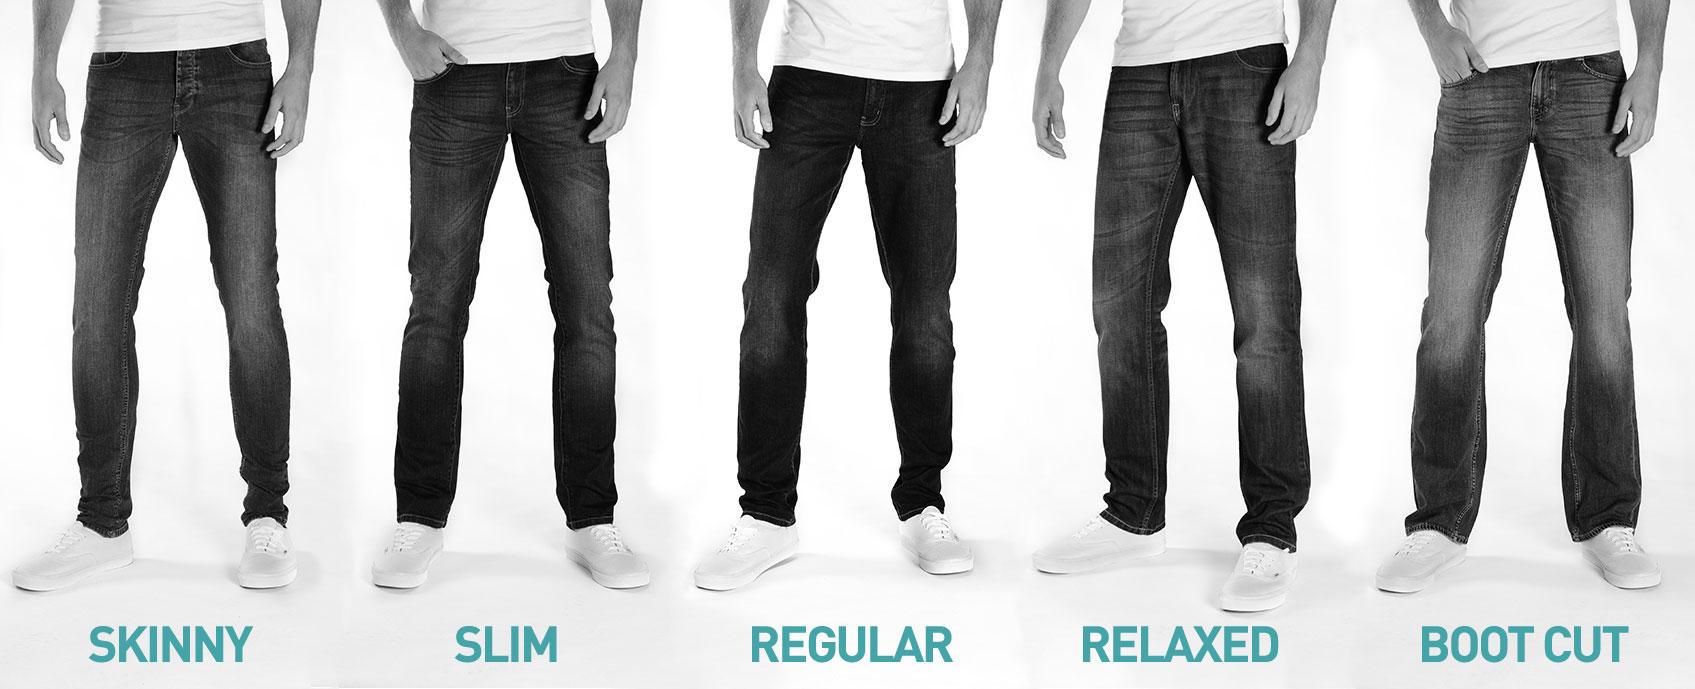 Tall Jeans Fits